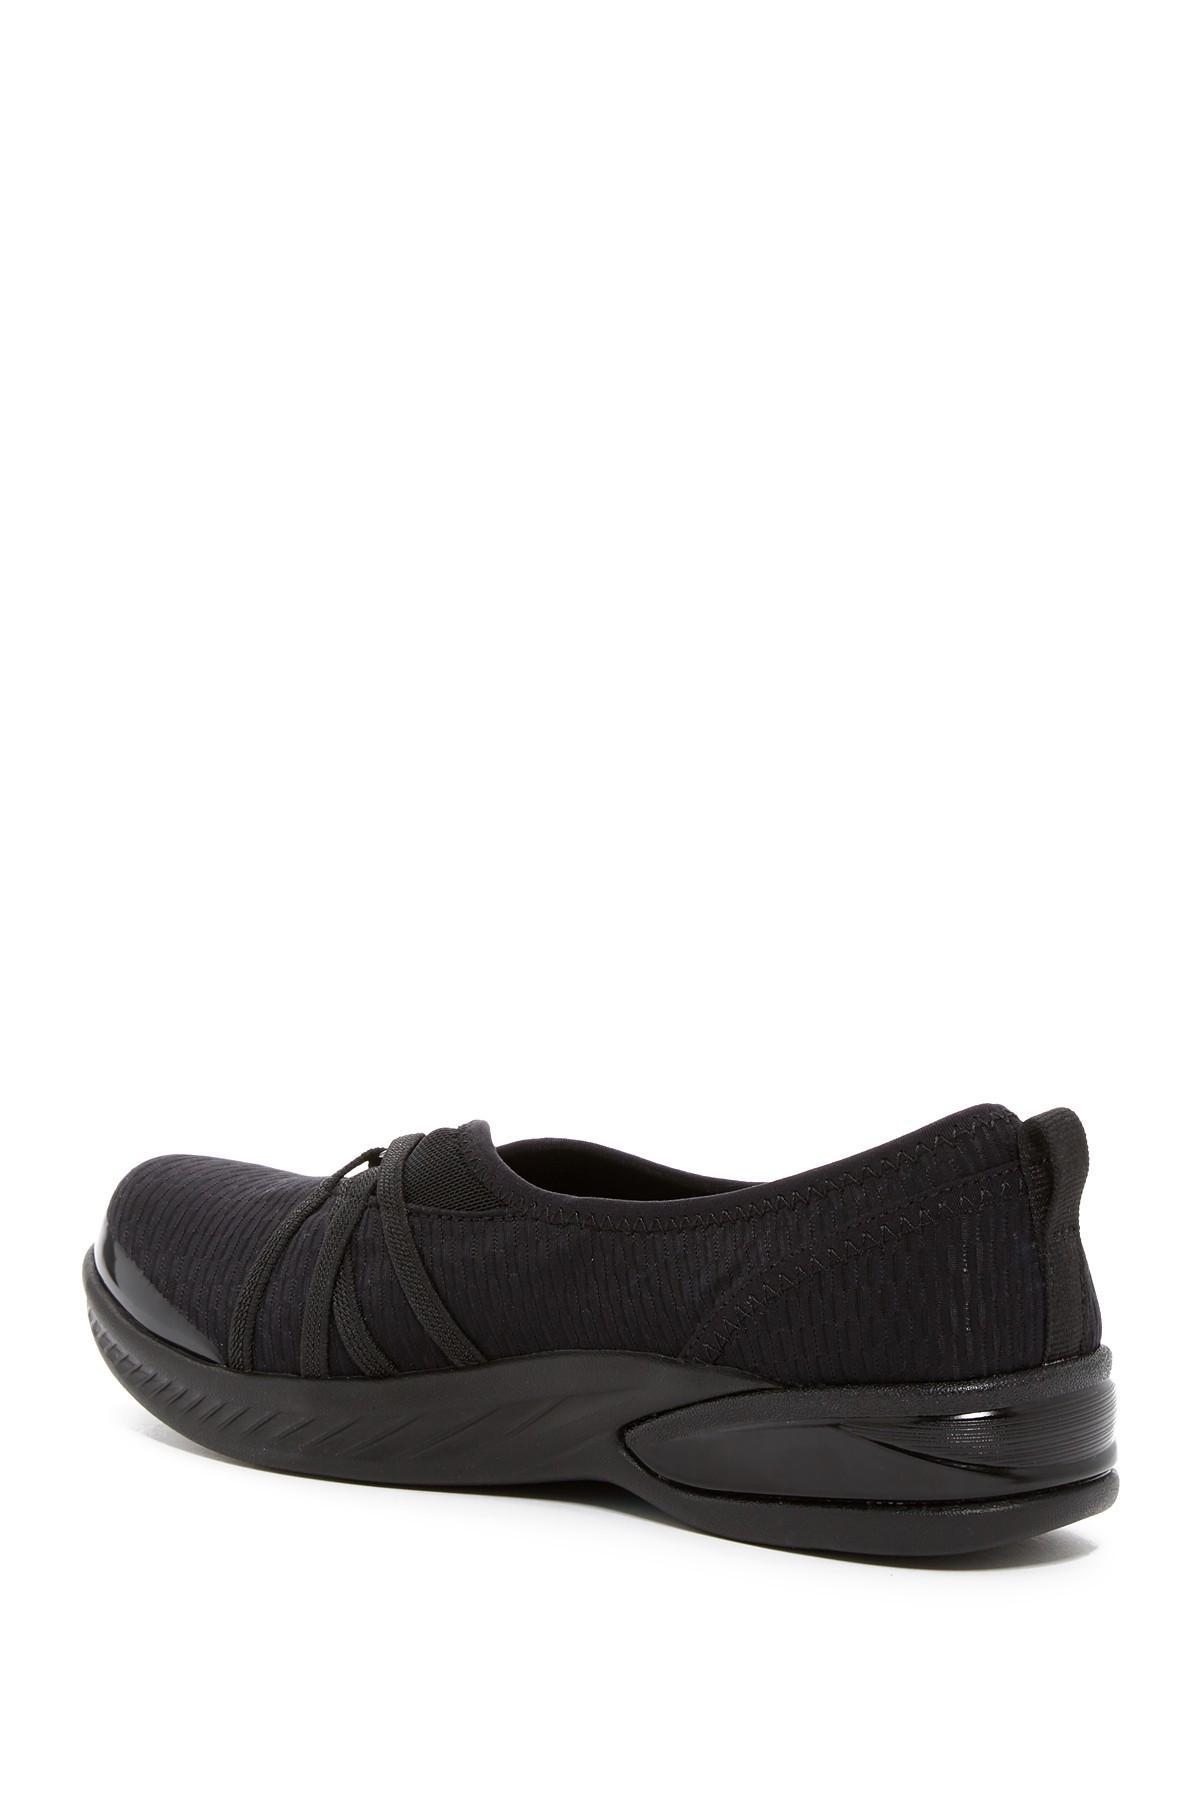 a2b54ac3cc38 Bzees - Black Niche Slip-on Sneaker - Wide Width Available - Lyst. View  fullscreen